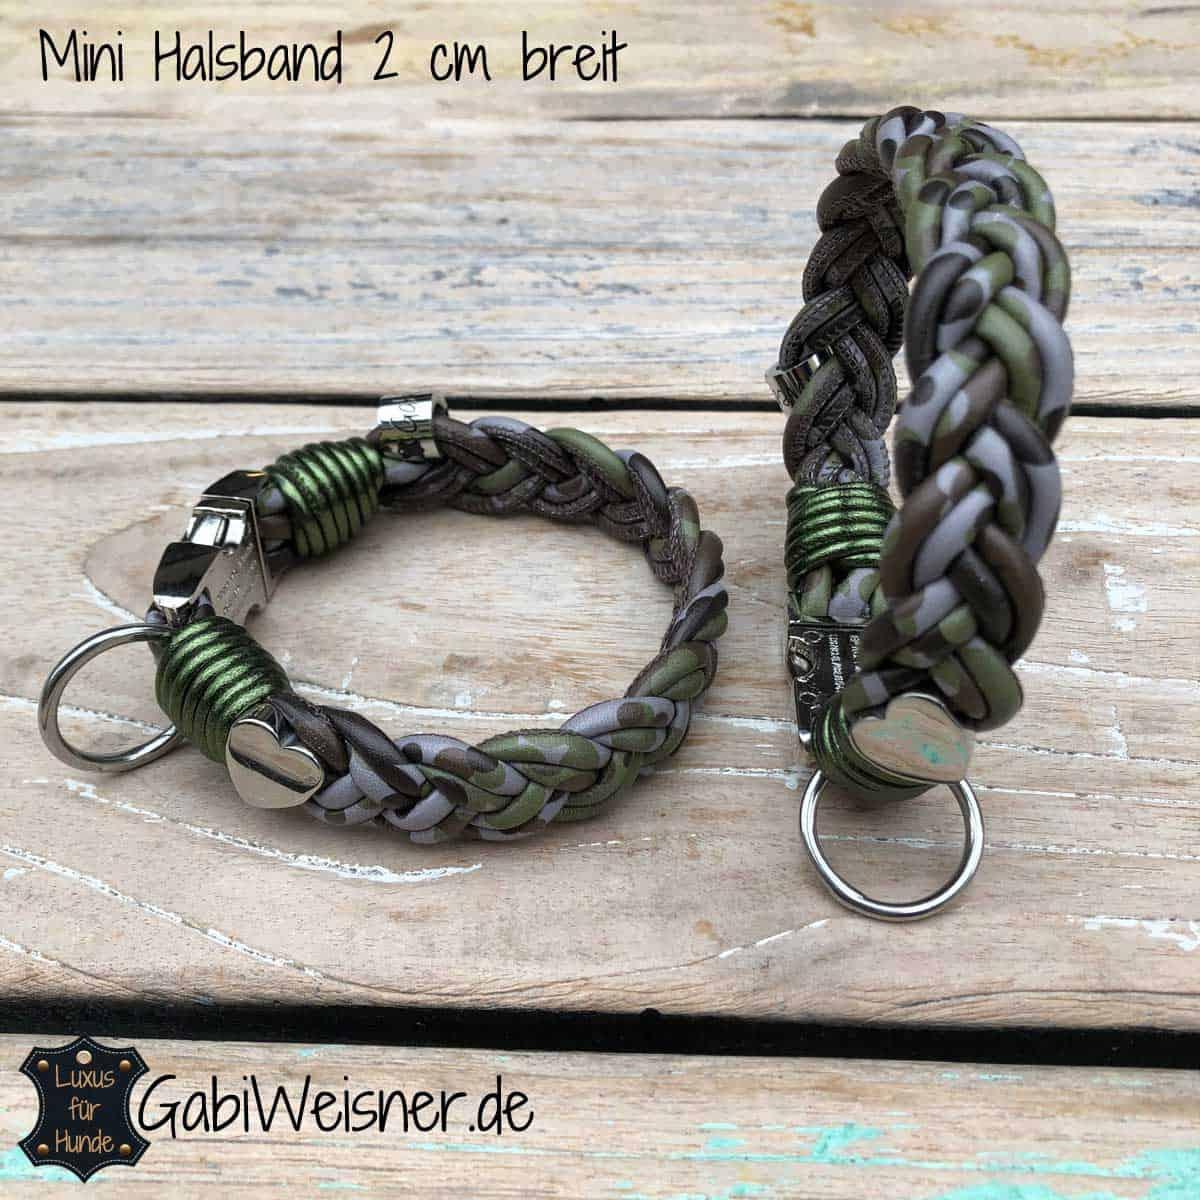 Mini Hundehalsband 2 cm breit Camouflage mit Herz